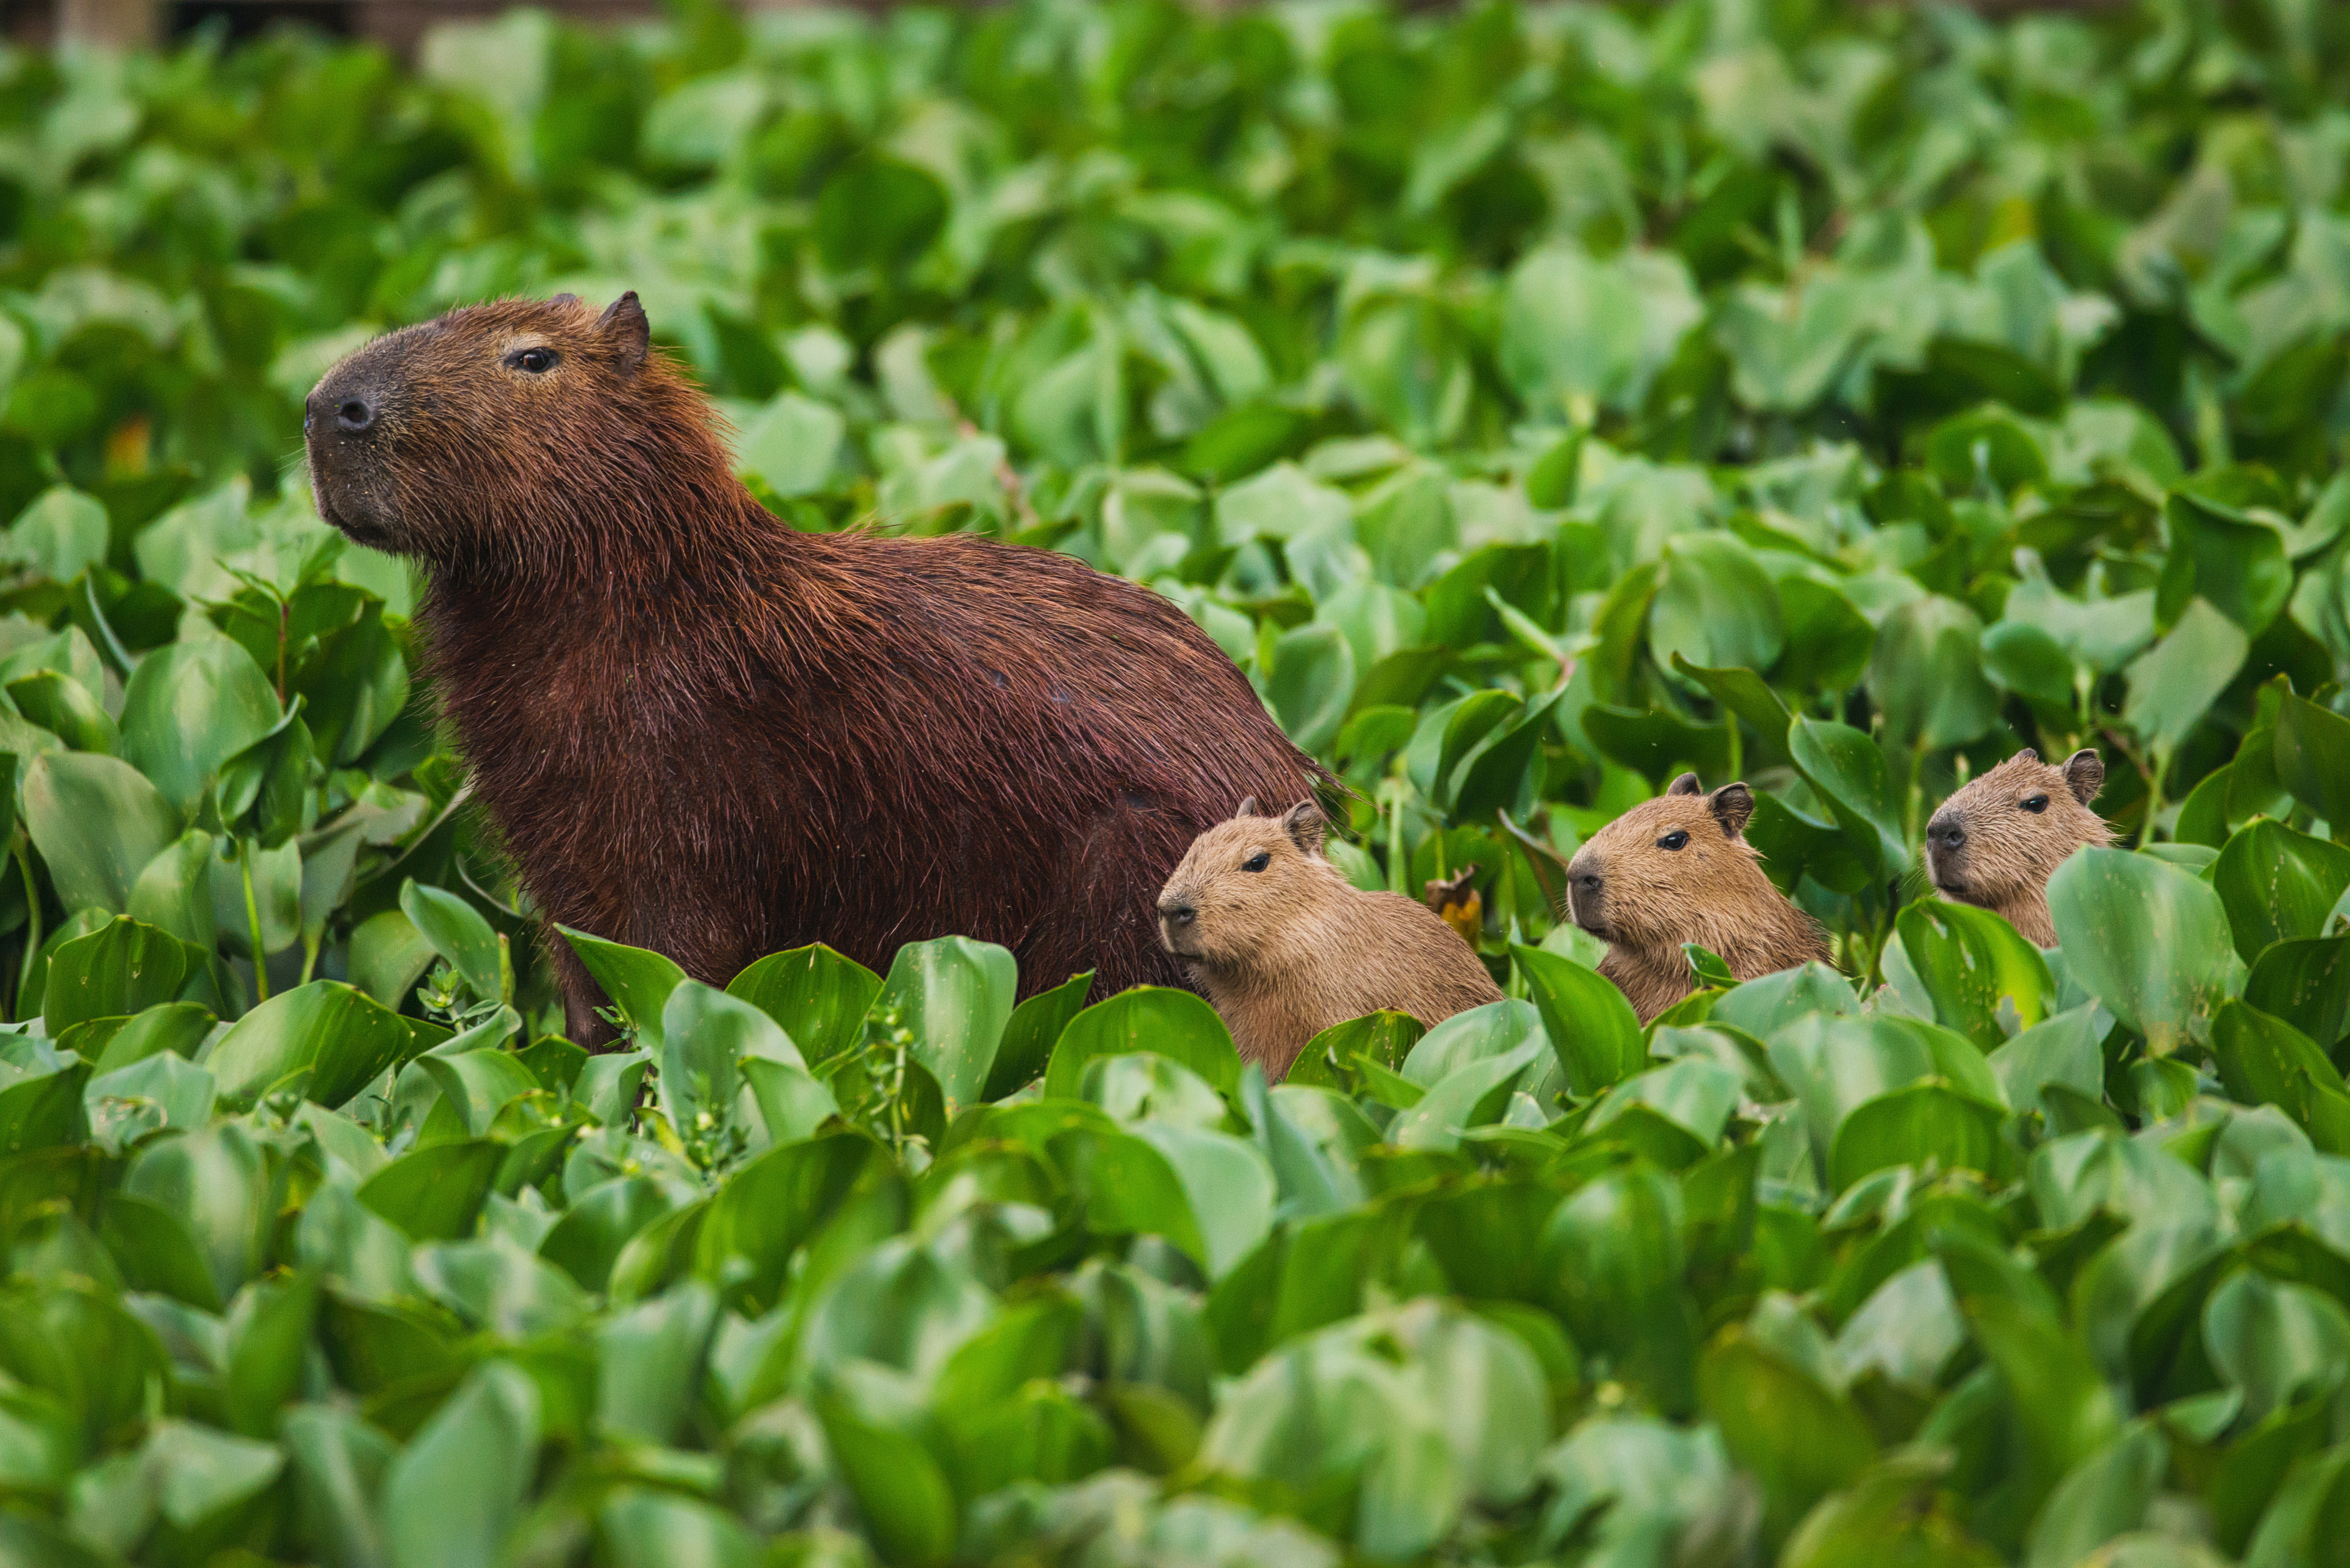 Capybara - Wikipedia